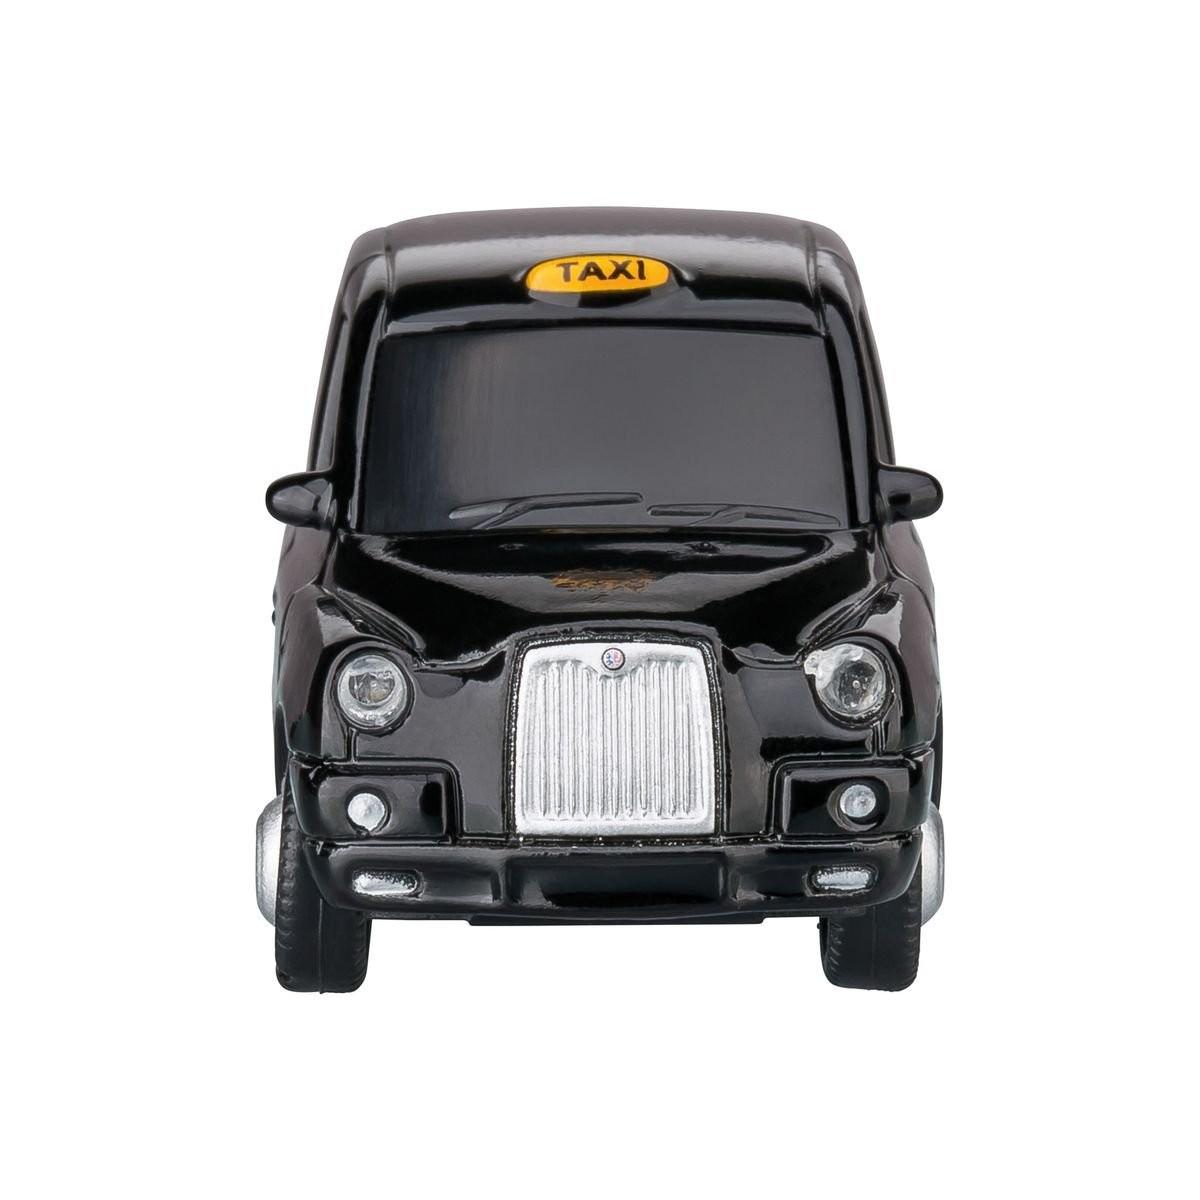 USB flash drive London Taxi TX4 1:72 BLACK 16GB, View 6